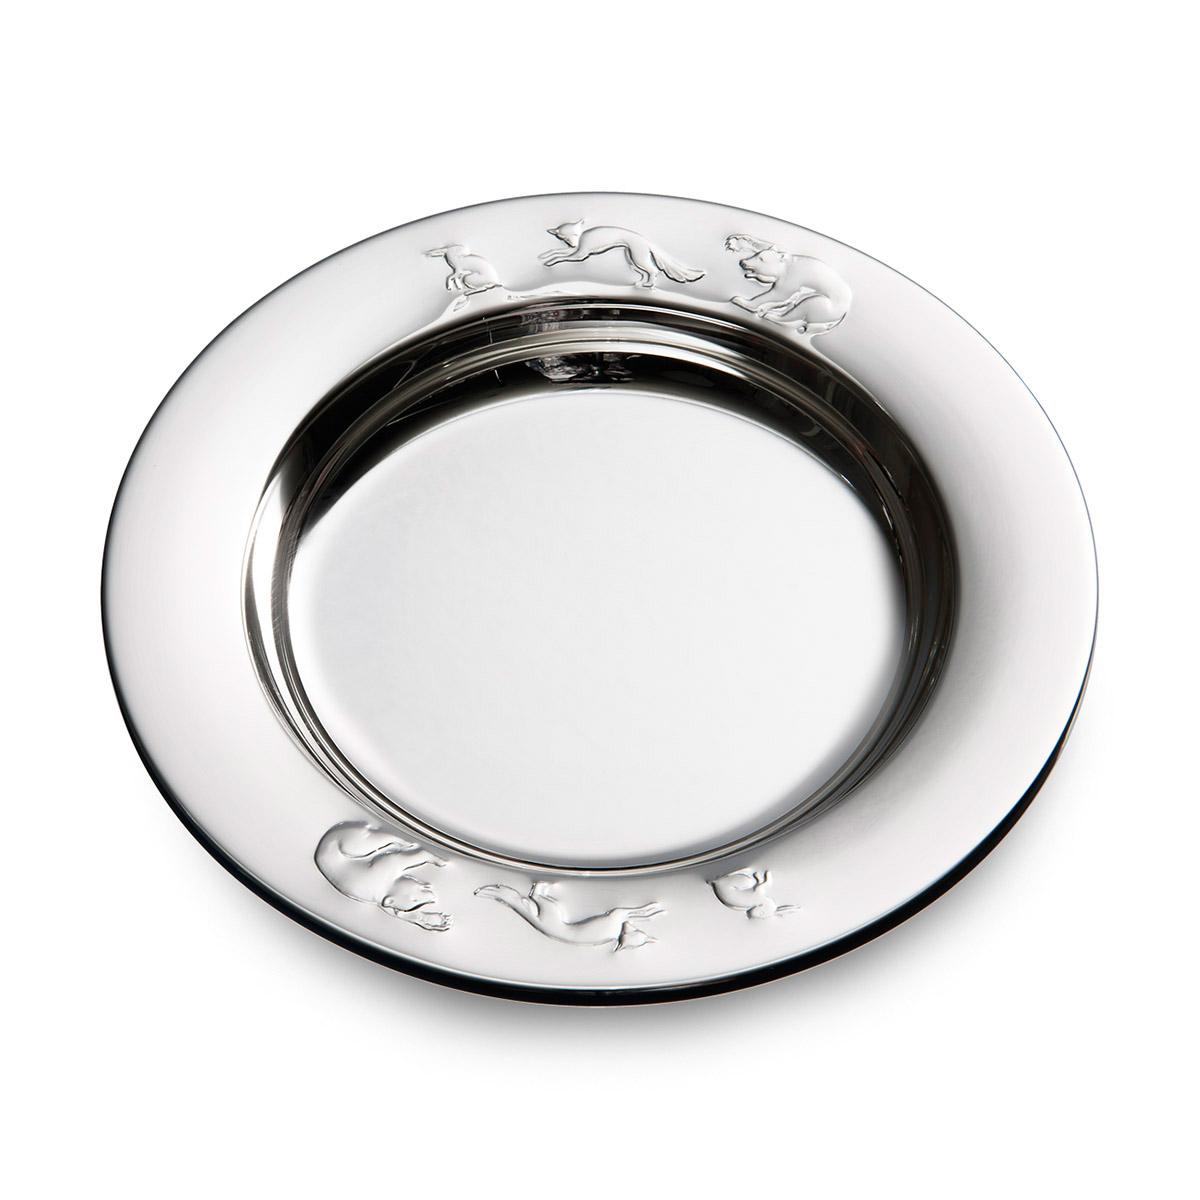 Mestergull Sølv grøtskål i mønsteret Bjørn, Rev & Hare B-R-H Skål / Tallerken